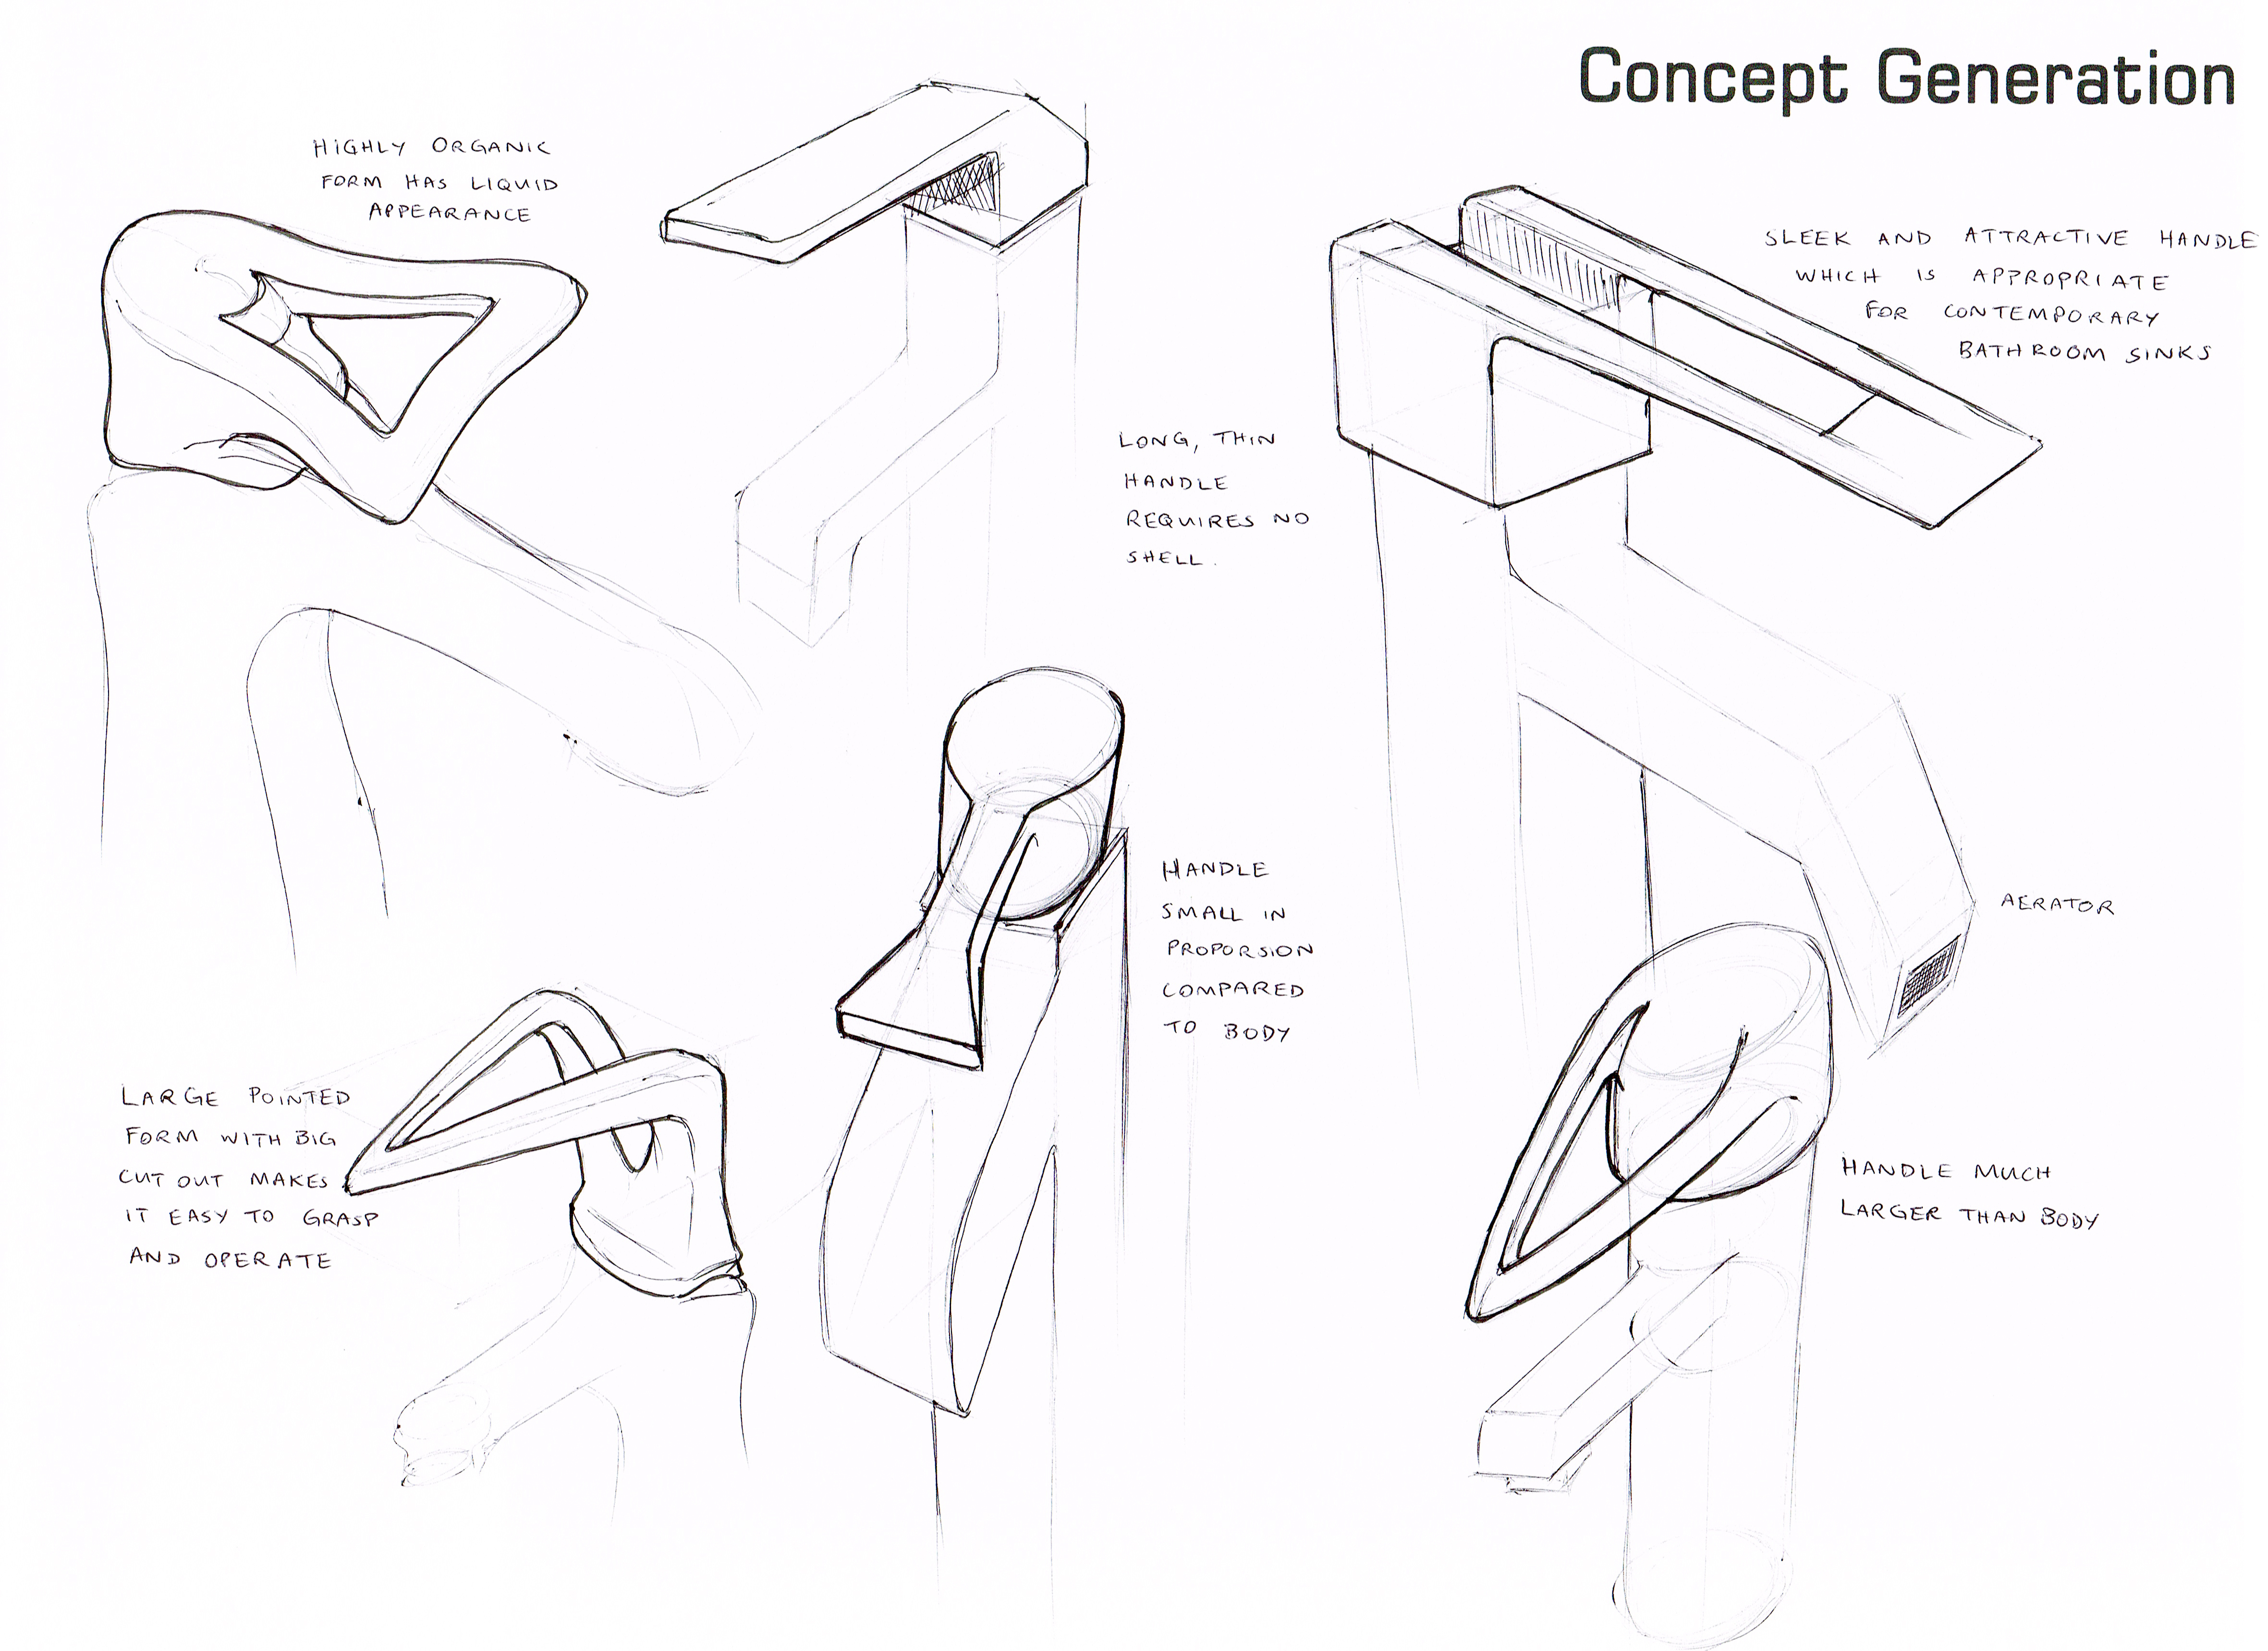 Concept Generation 5